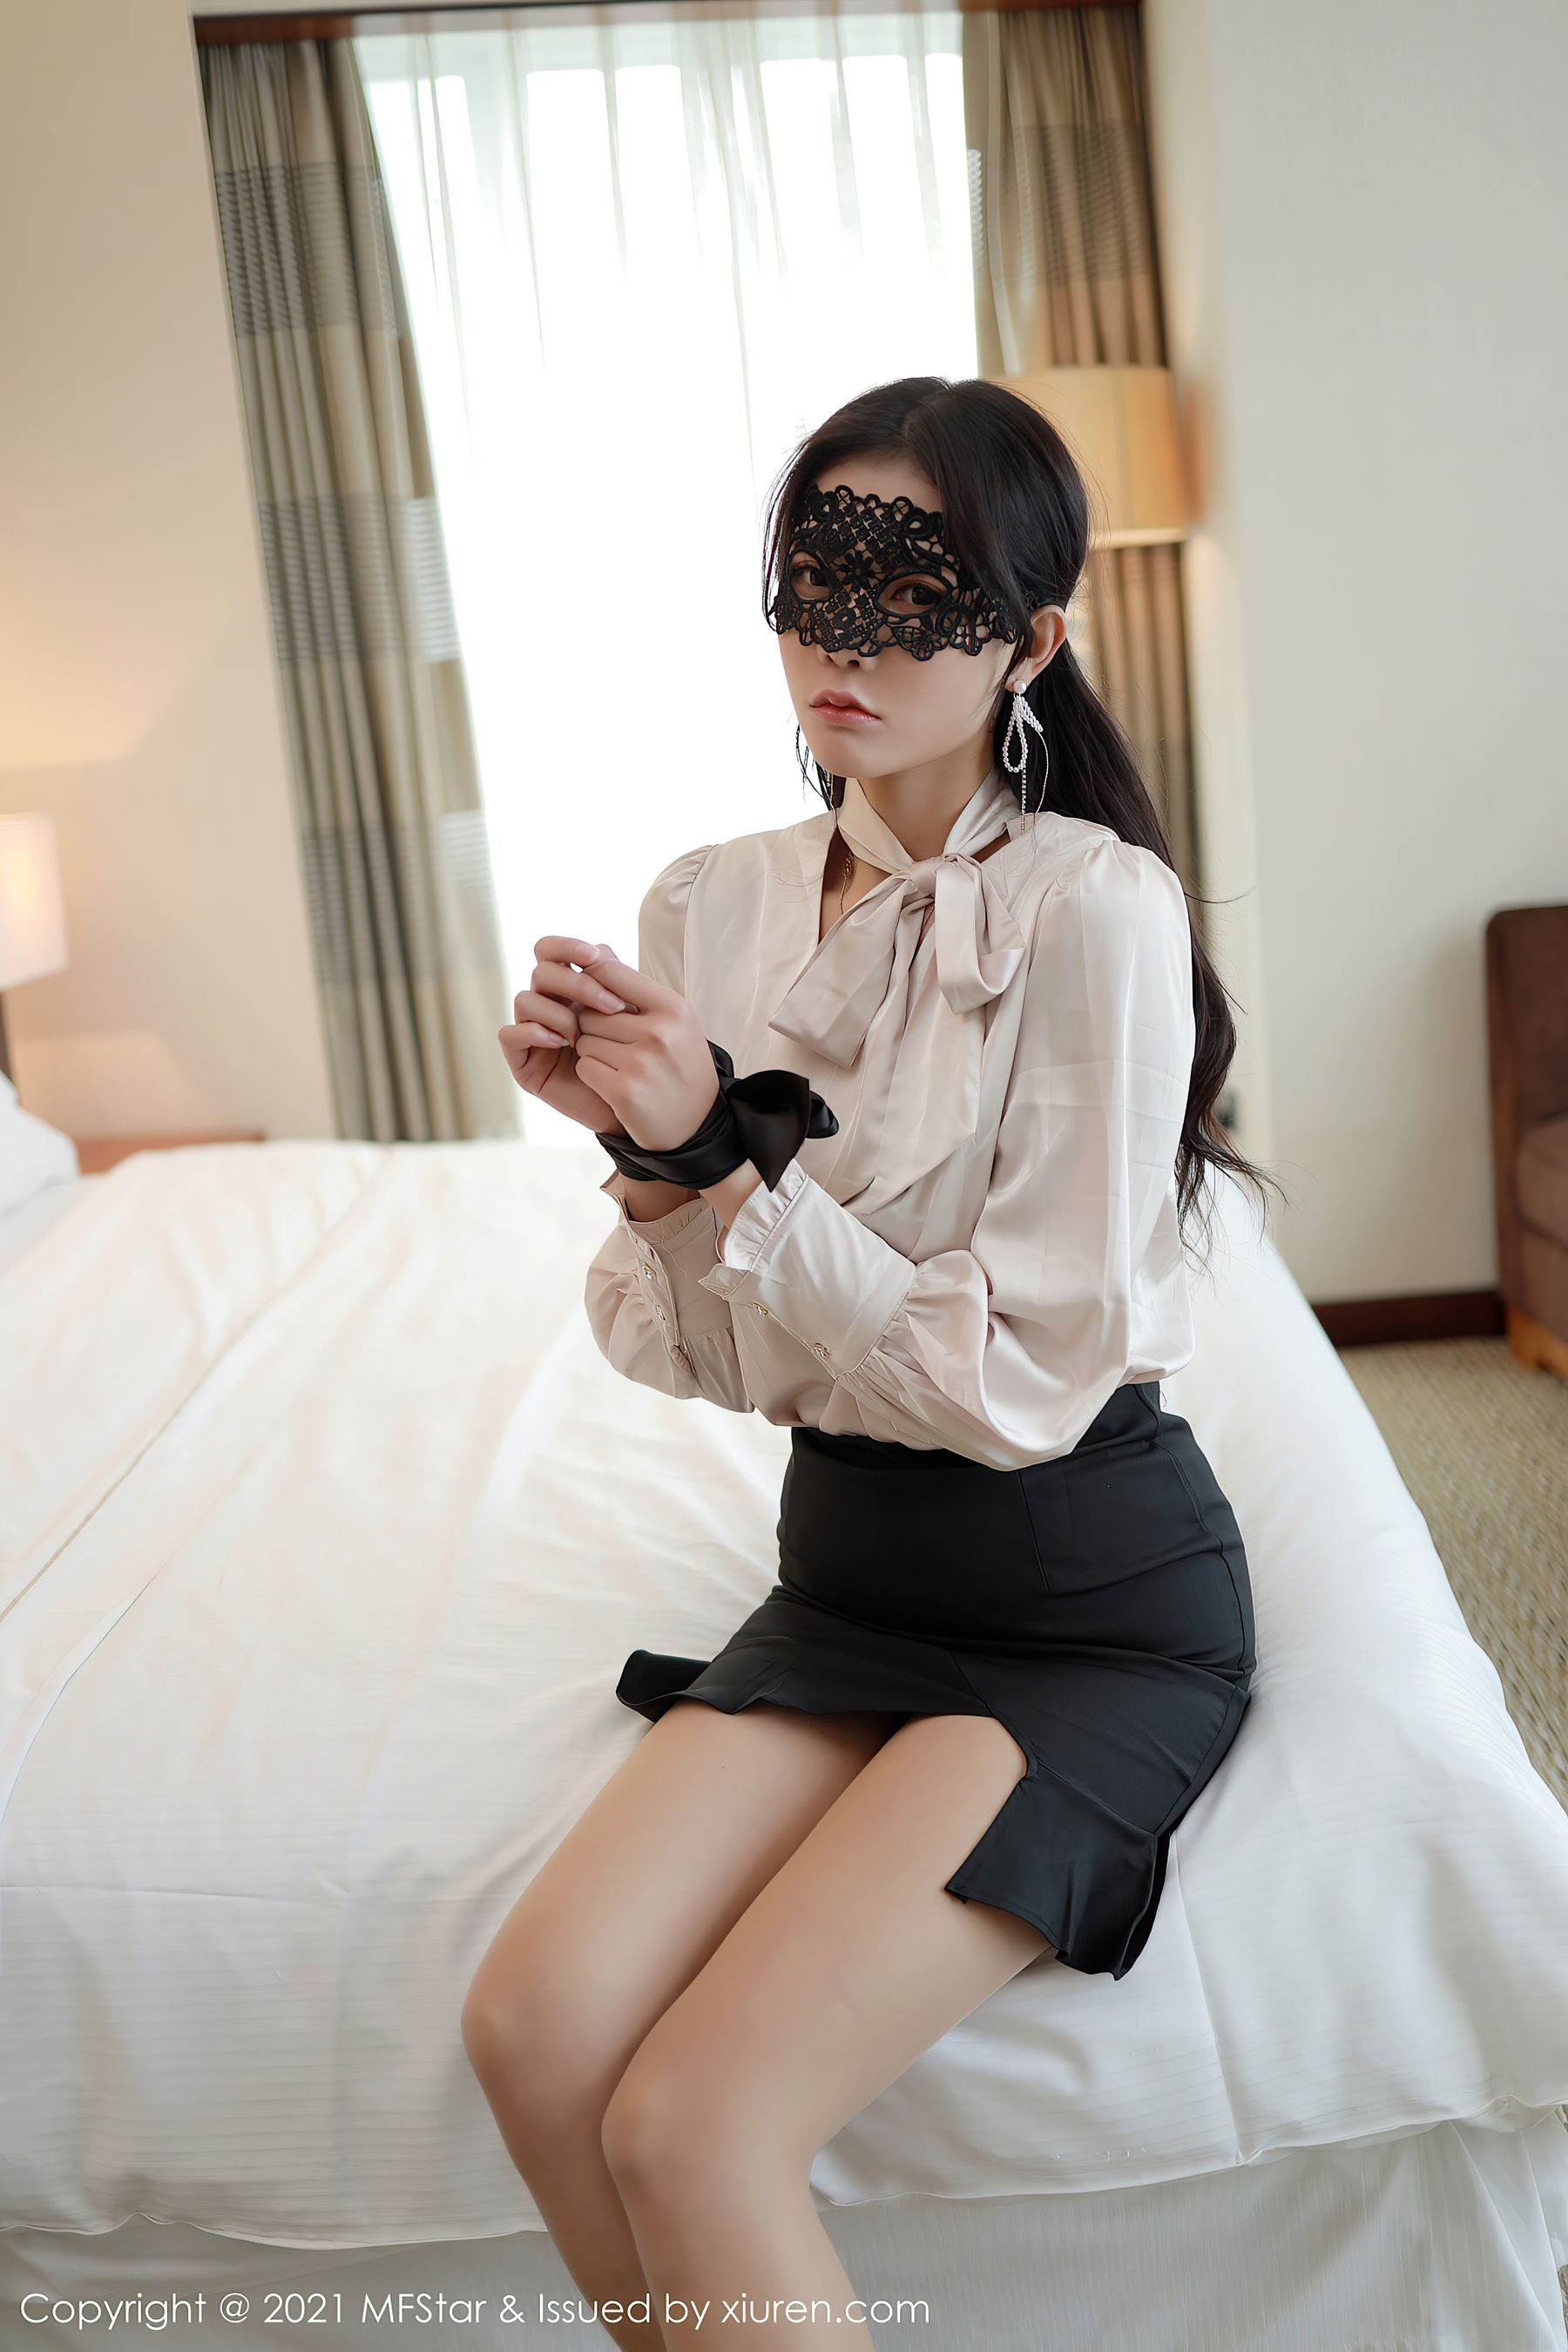 VOL.182 [模范学院]捆绑绳艺情趣内衣性感女郎:小娜比(模特小娜比)超高清写真套图(59P)